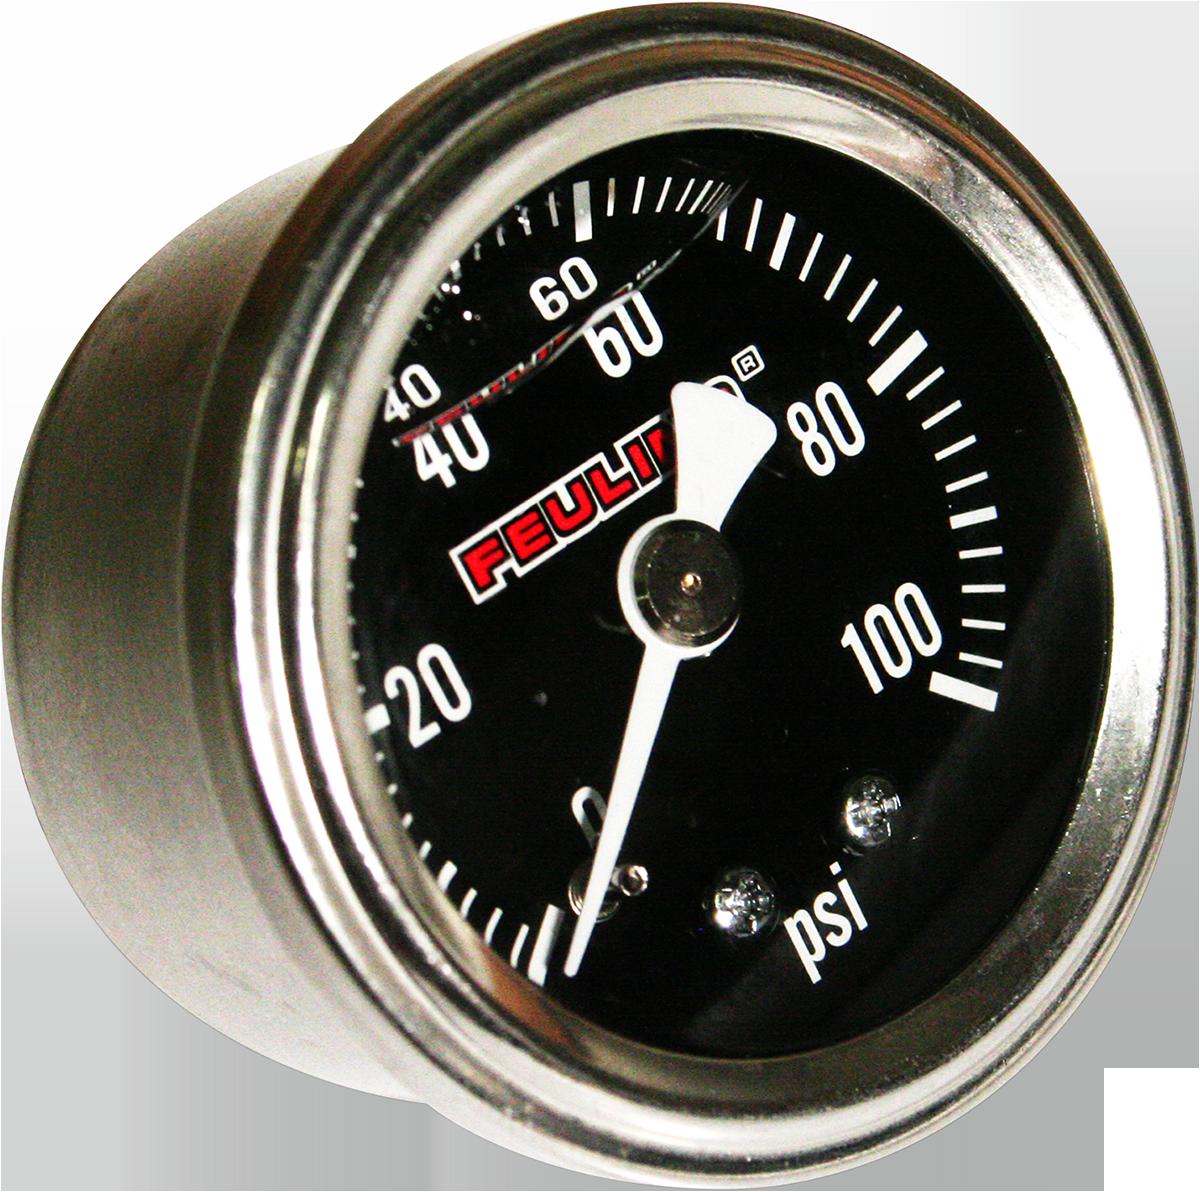 Feuling Stainless Back Port Universal Motorcycle 100PSI Oil Pressure Gauge